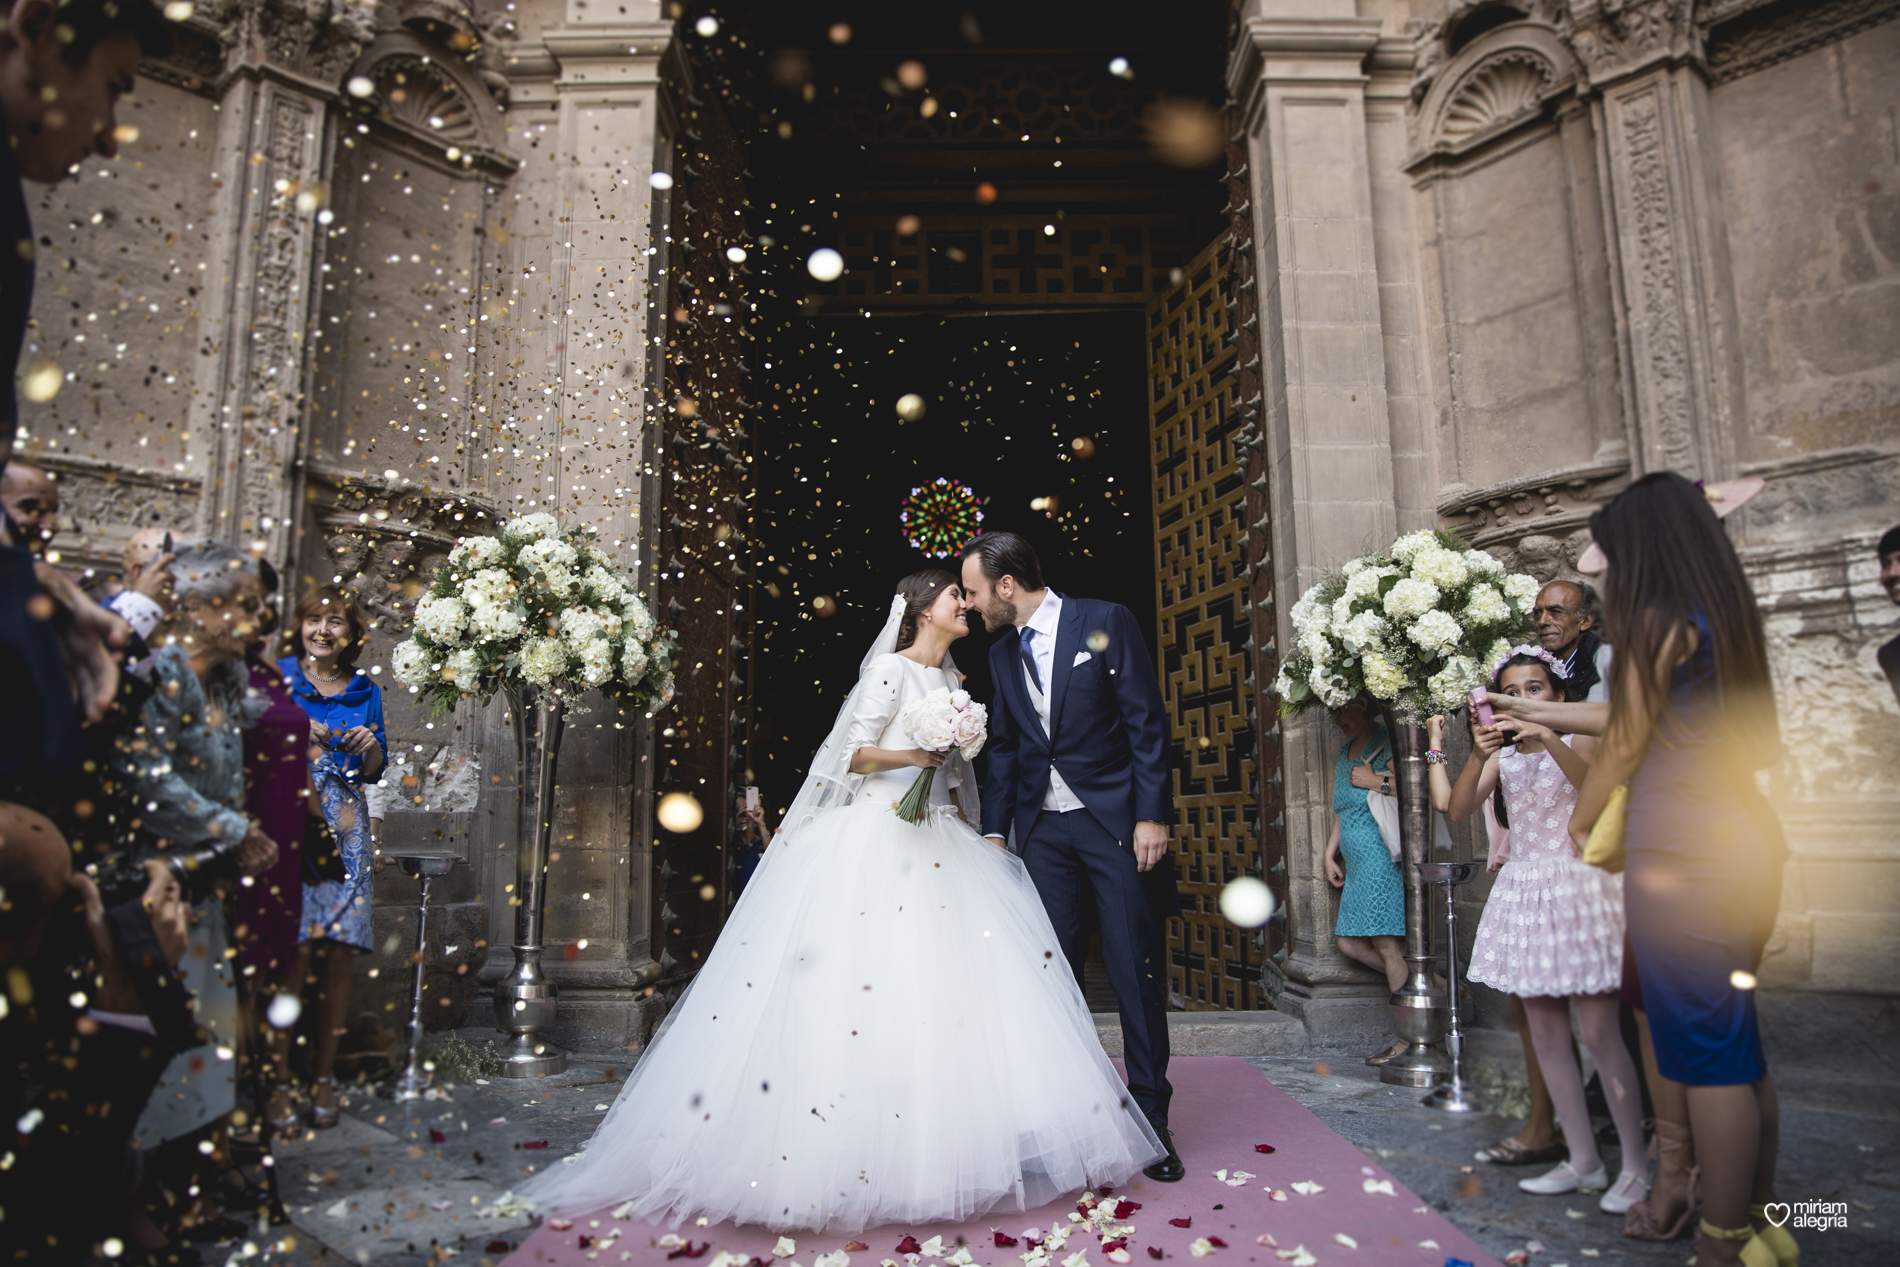 boda-en-la-catedral-de-murcia-miriam-alegria-fotografos-boda-murcia-56